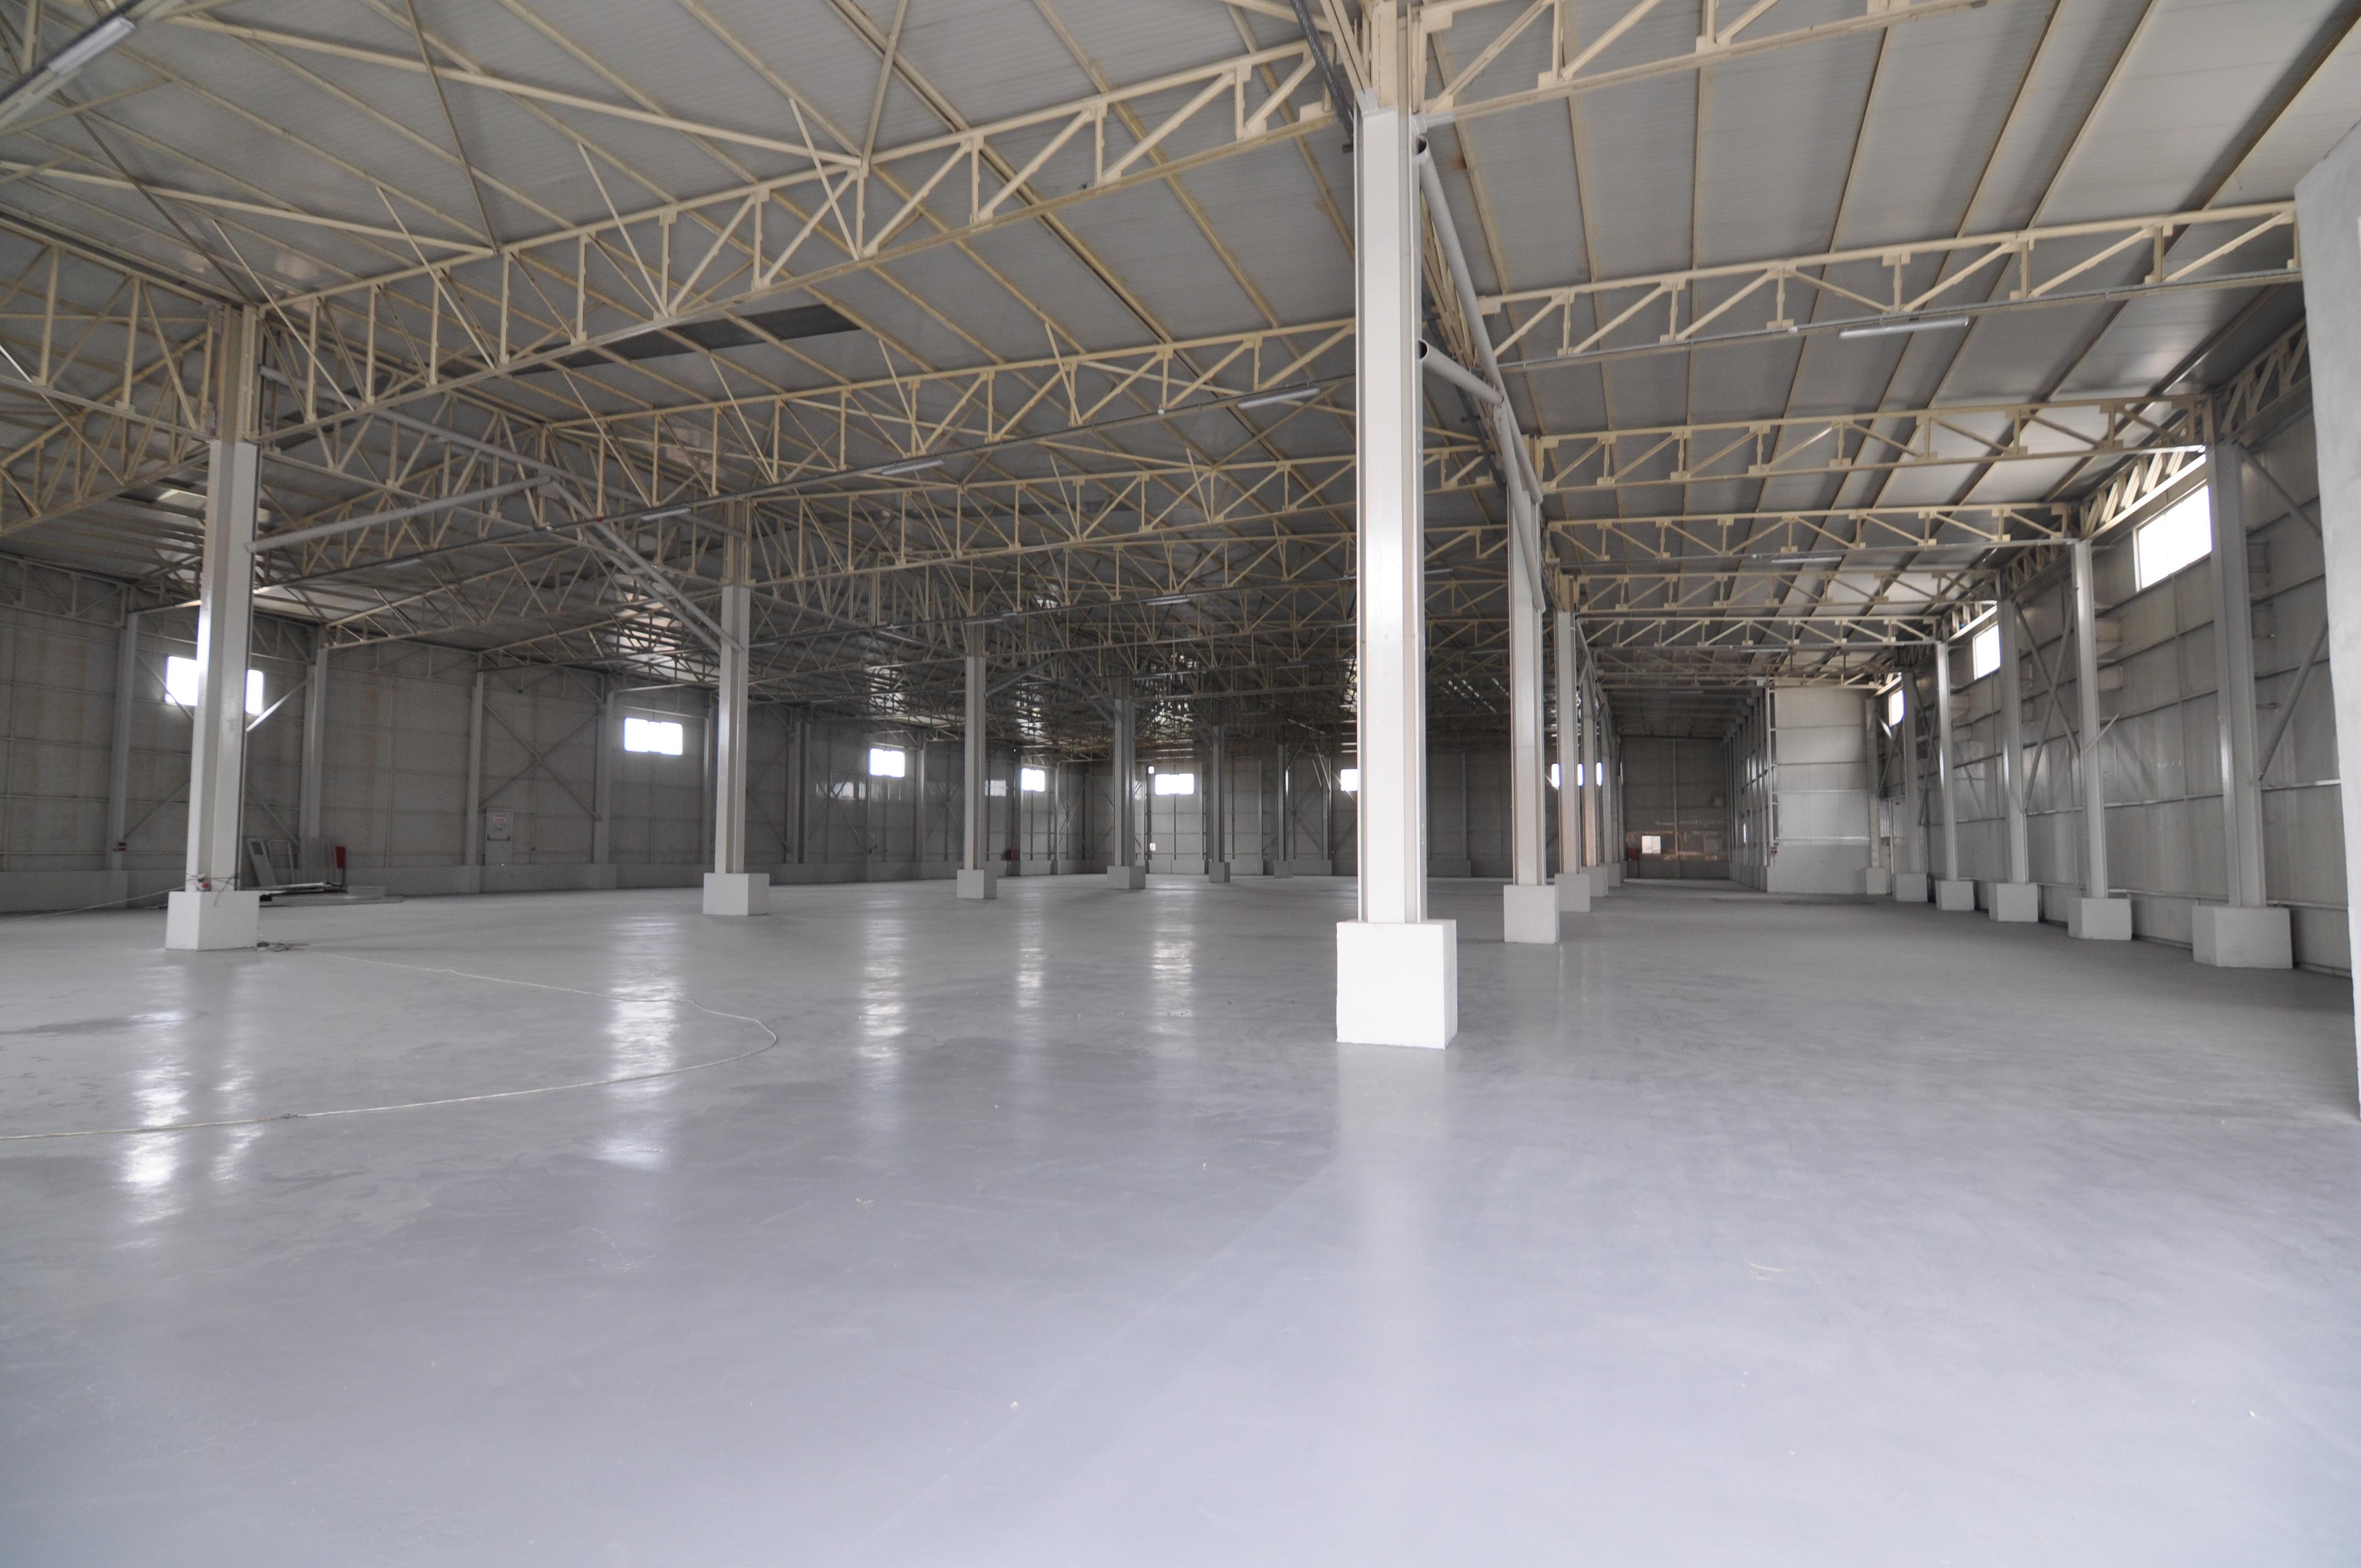 Hadımköy Düz Giriş 4.000 m2 , H:8mt, Kiralık Depo-Fabrika